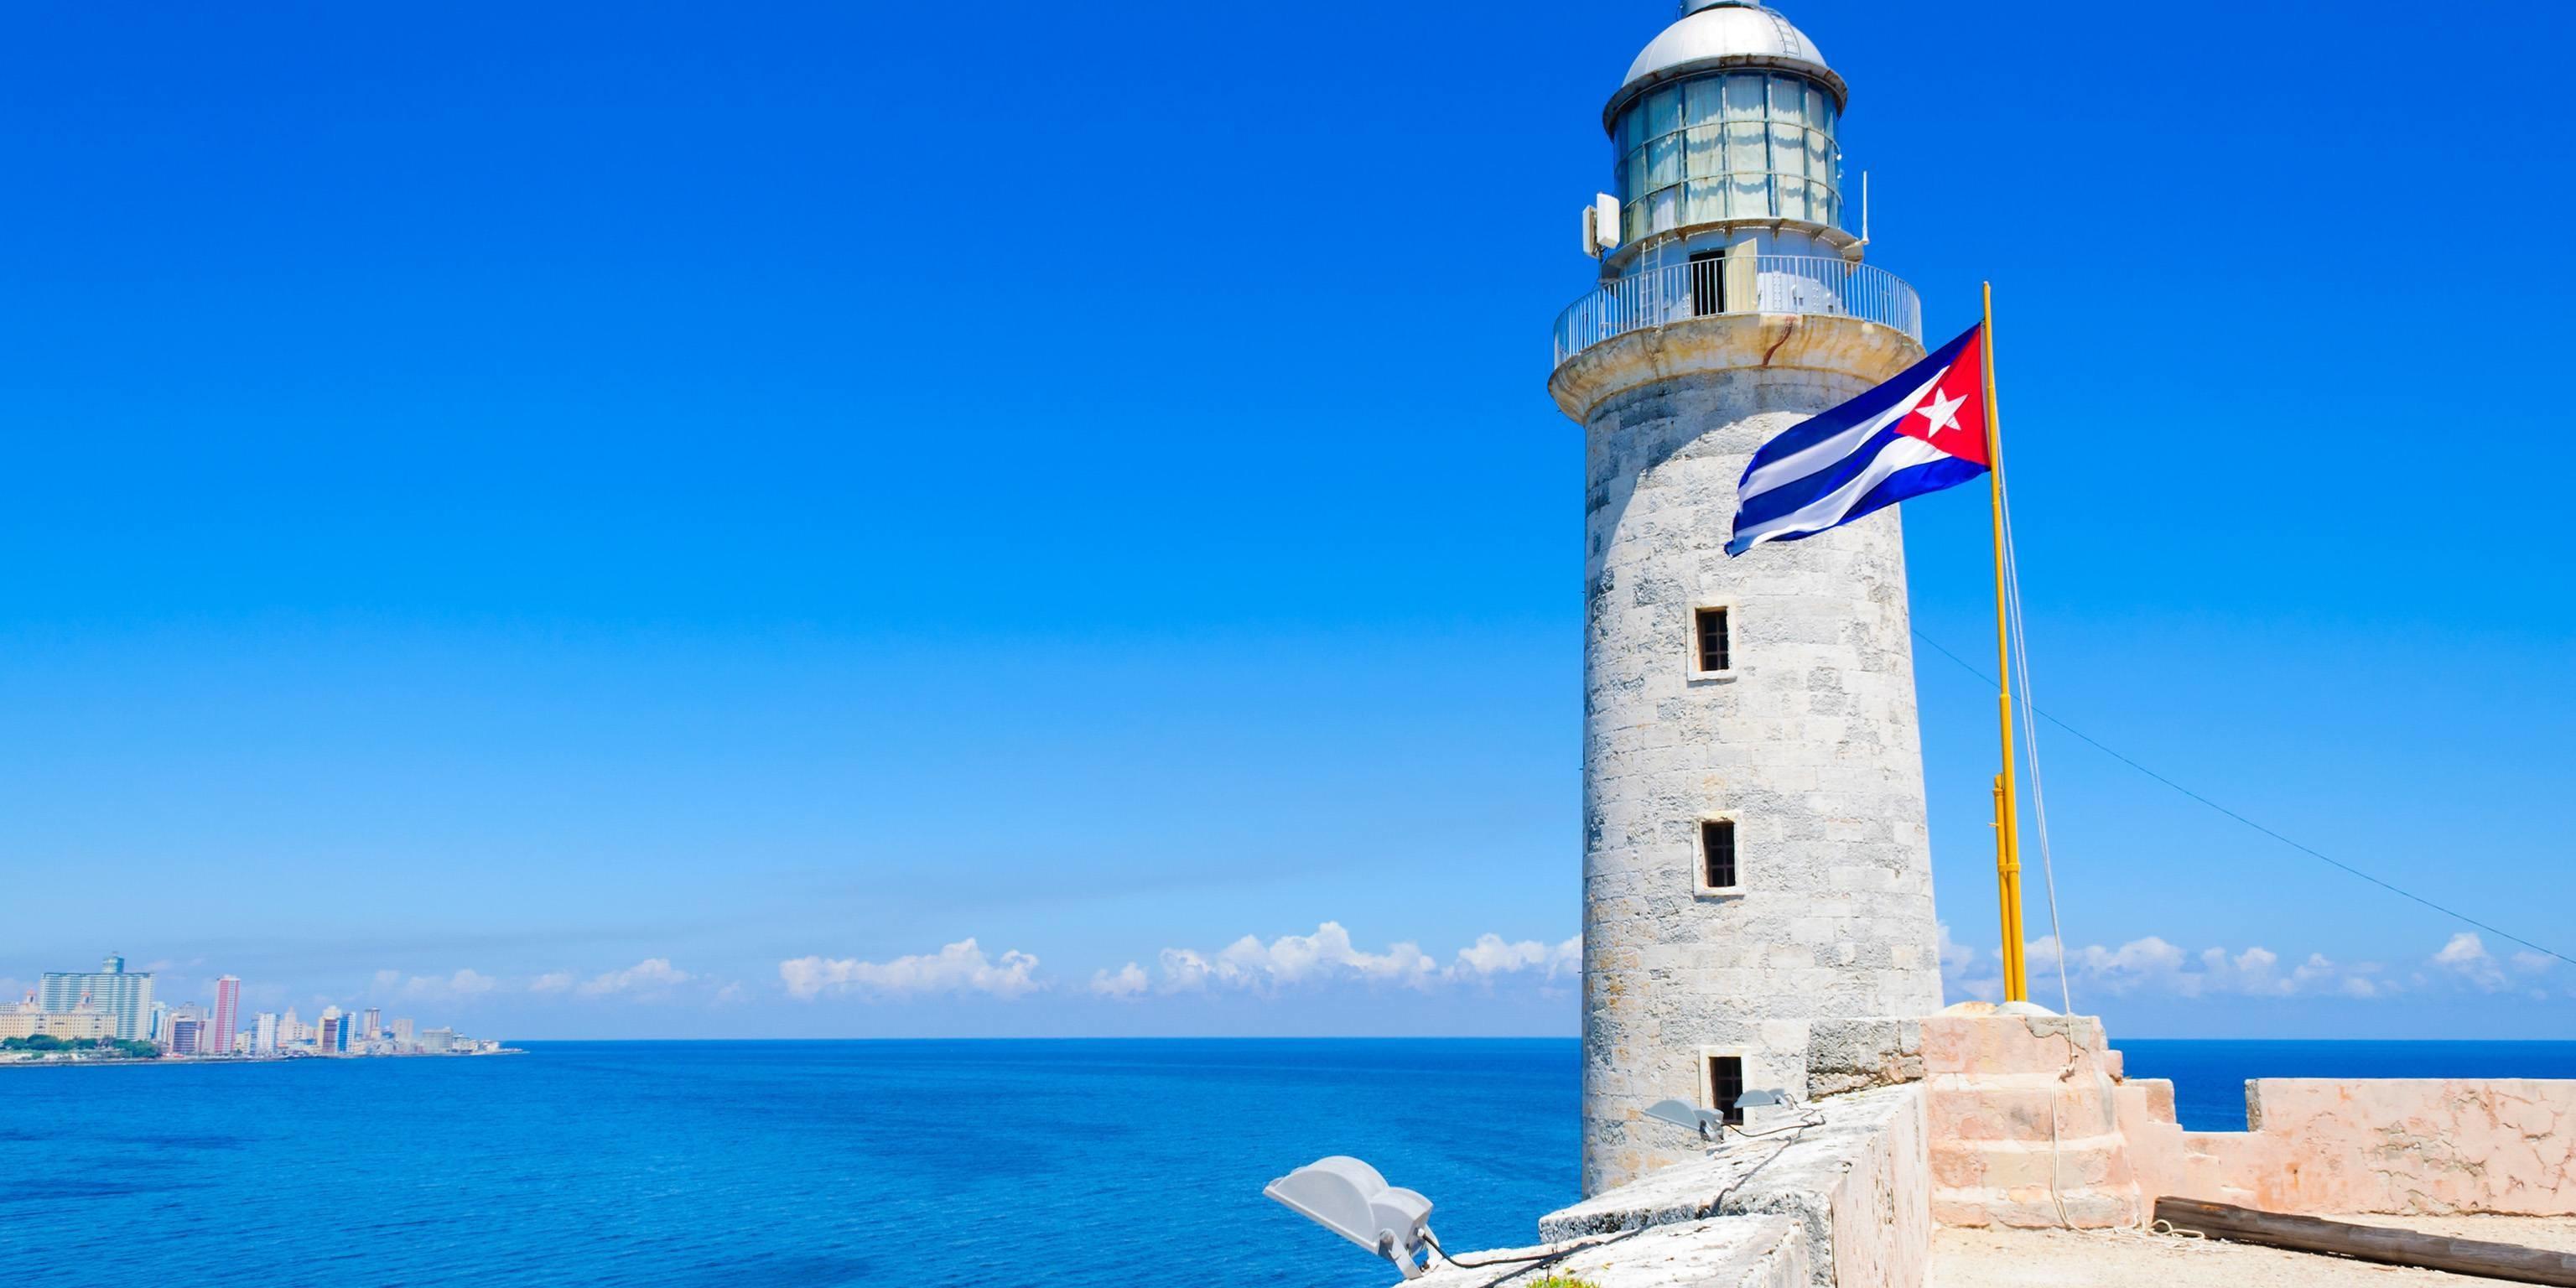 Let's Go To Cuba